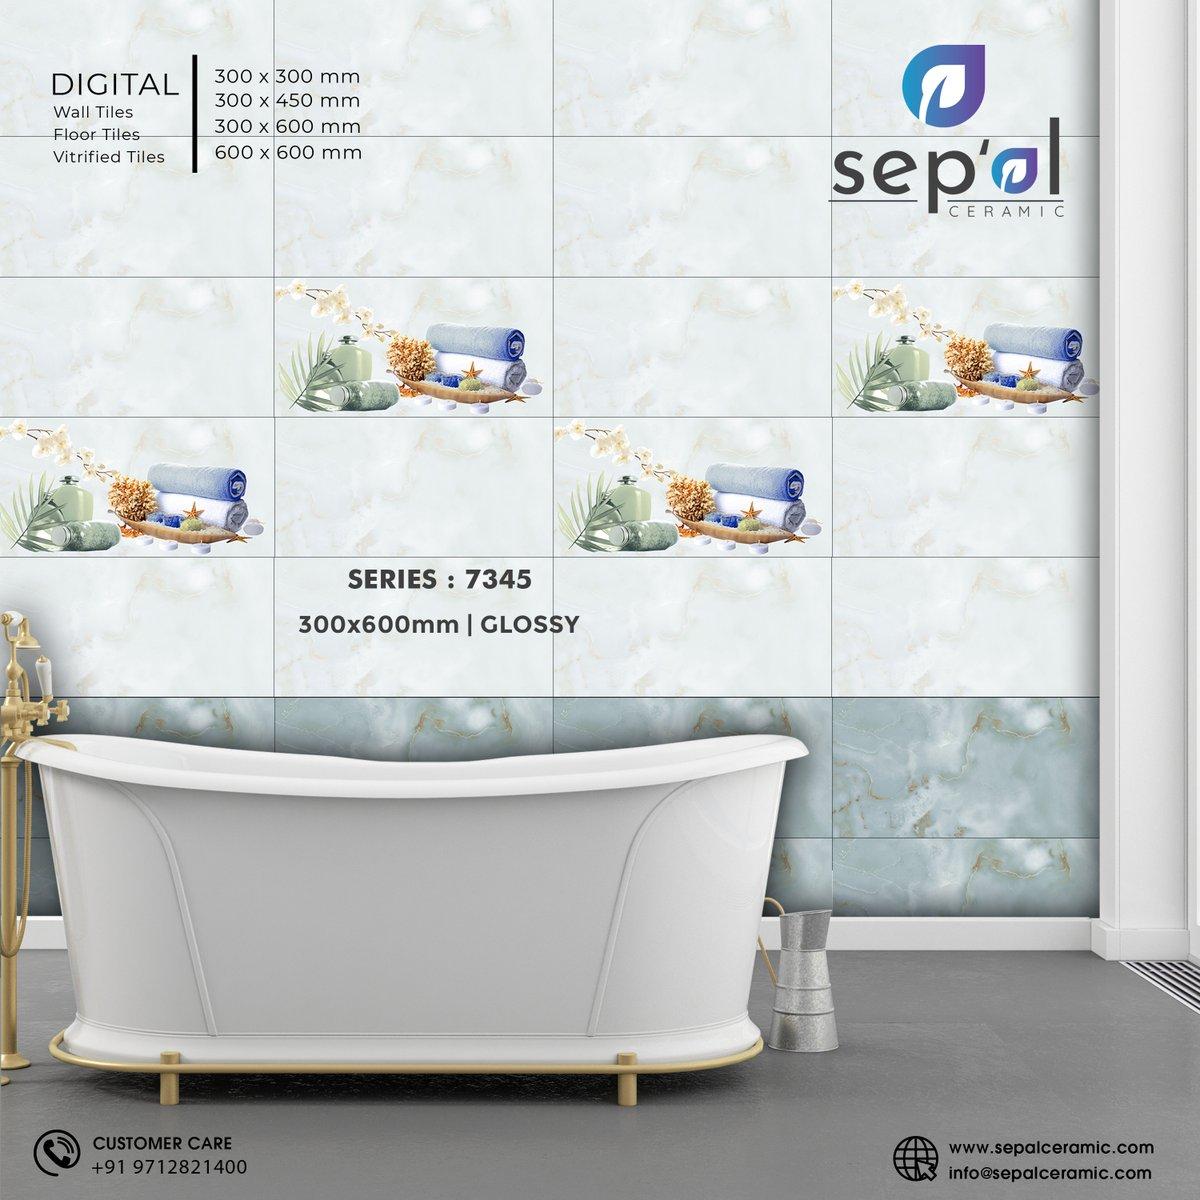 Series no 7345   300x600mm   Glossy #sepal #Sepalceramic #vitrified #manufacturing #tiles #ceramics #matt #glossy #Exporter #walldecor #Digitalwalltiles #TilesOfIndia #manufacturer #InteriorDecor #digitaltiles #sepalDesigns #Moderation #morbipic.twitter.com/mEr9lEze5V